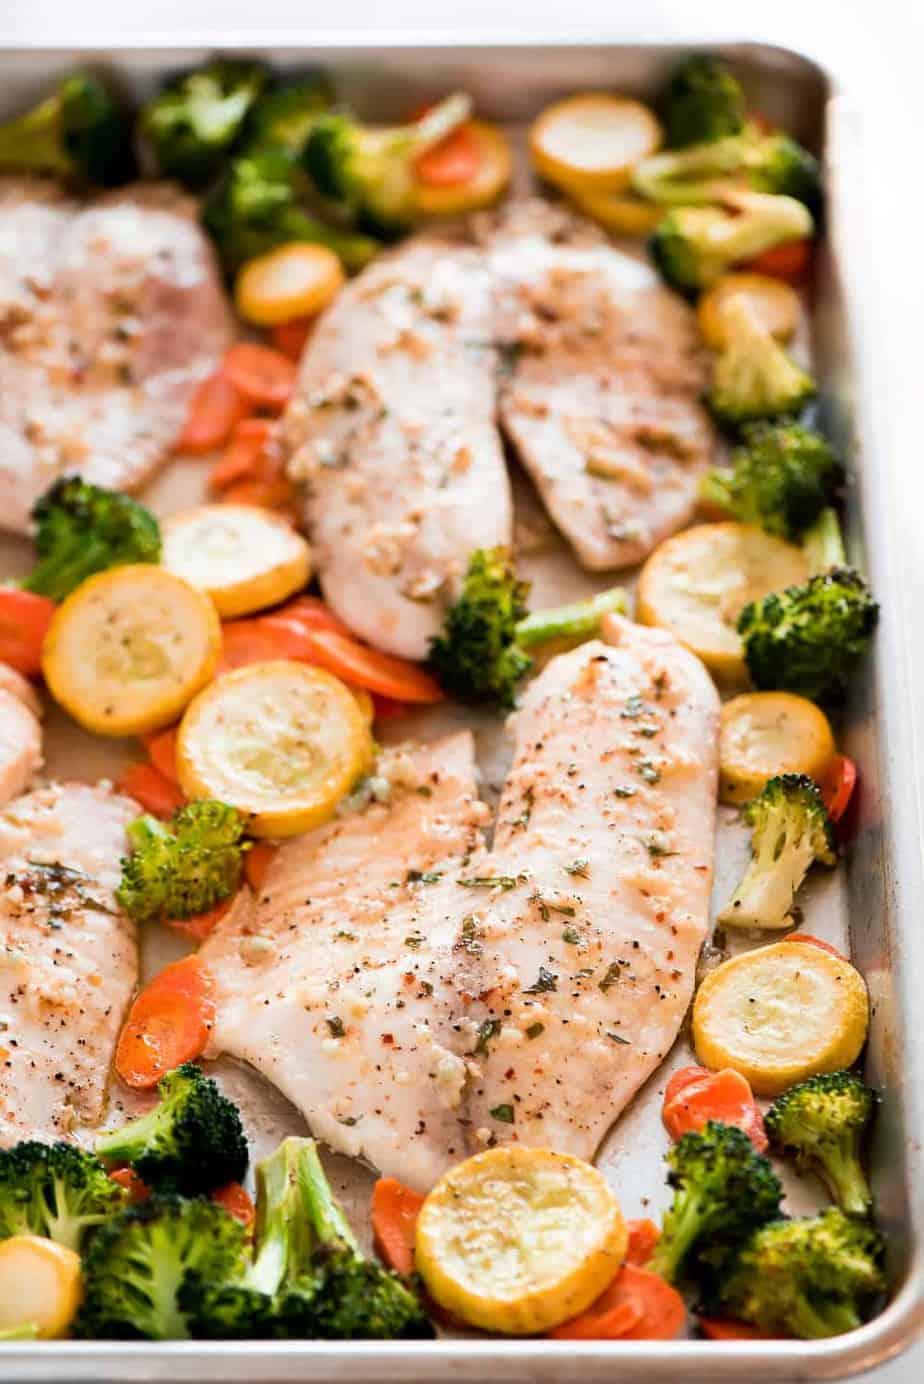 baked-tilapia-roasted-veggies-5